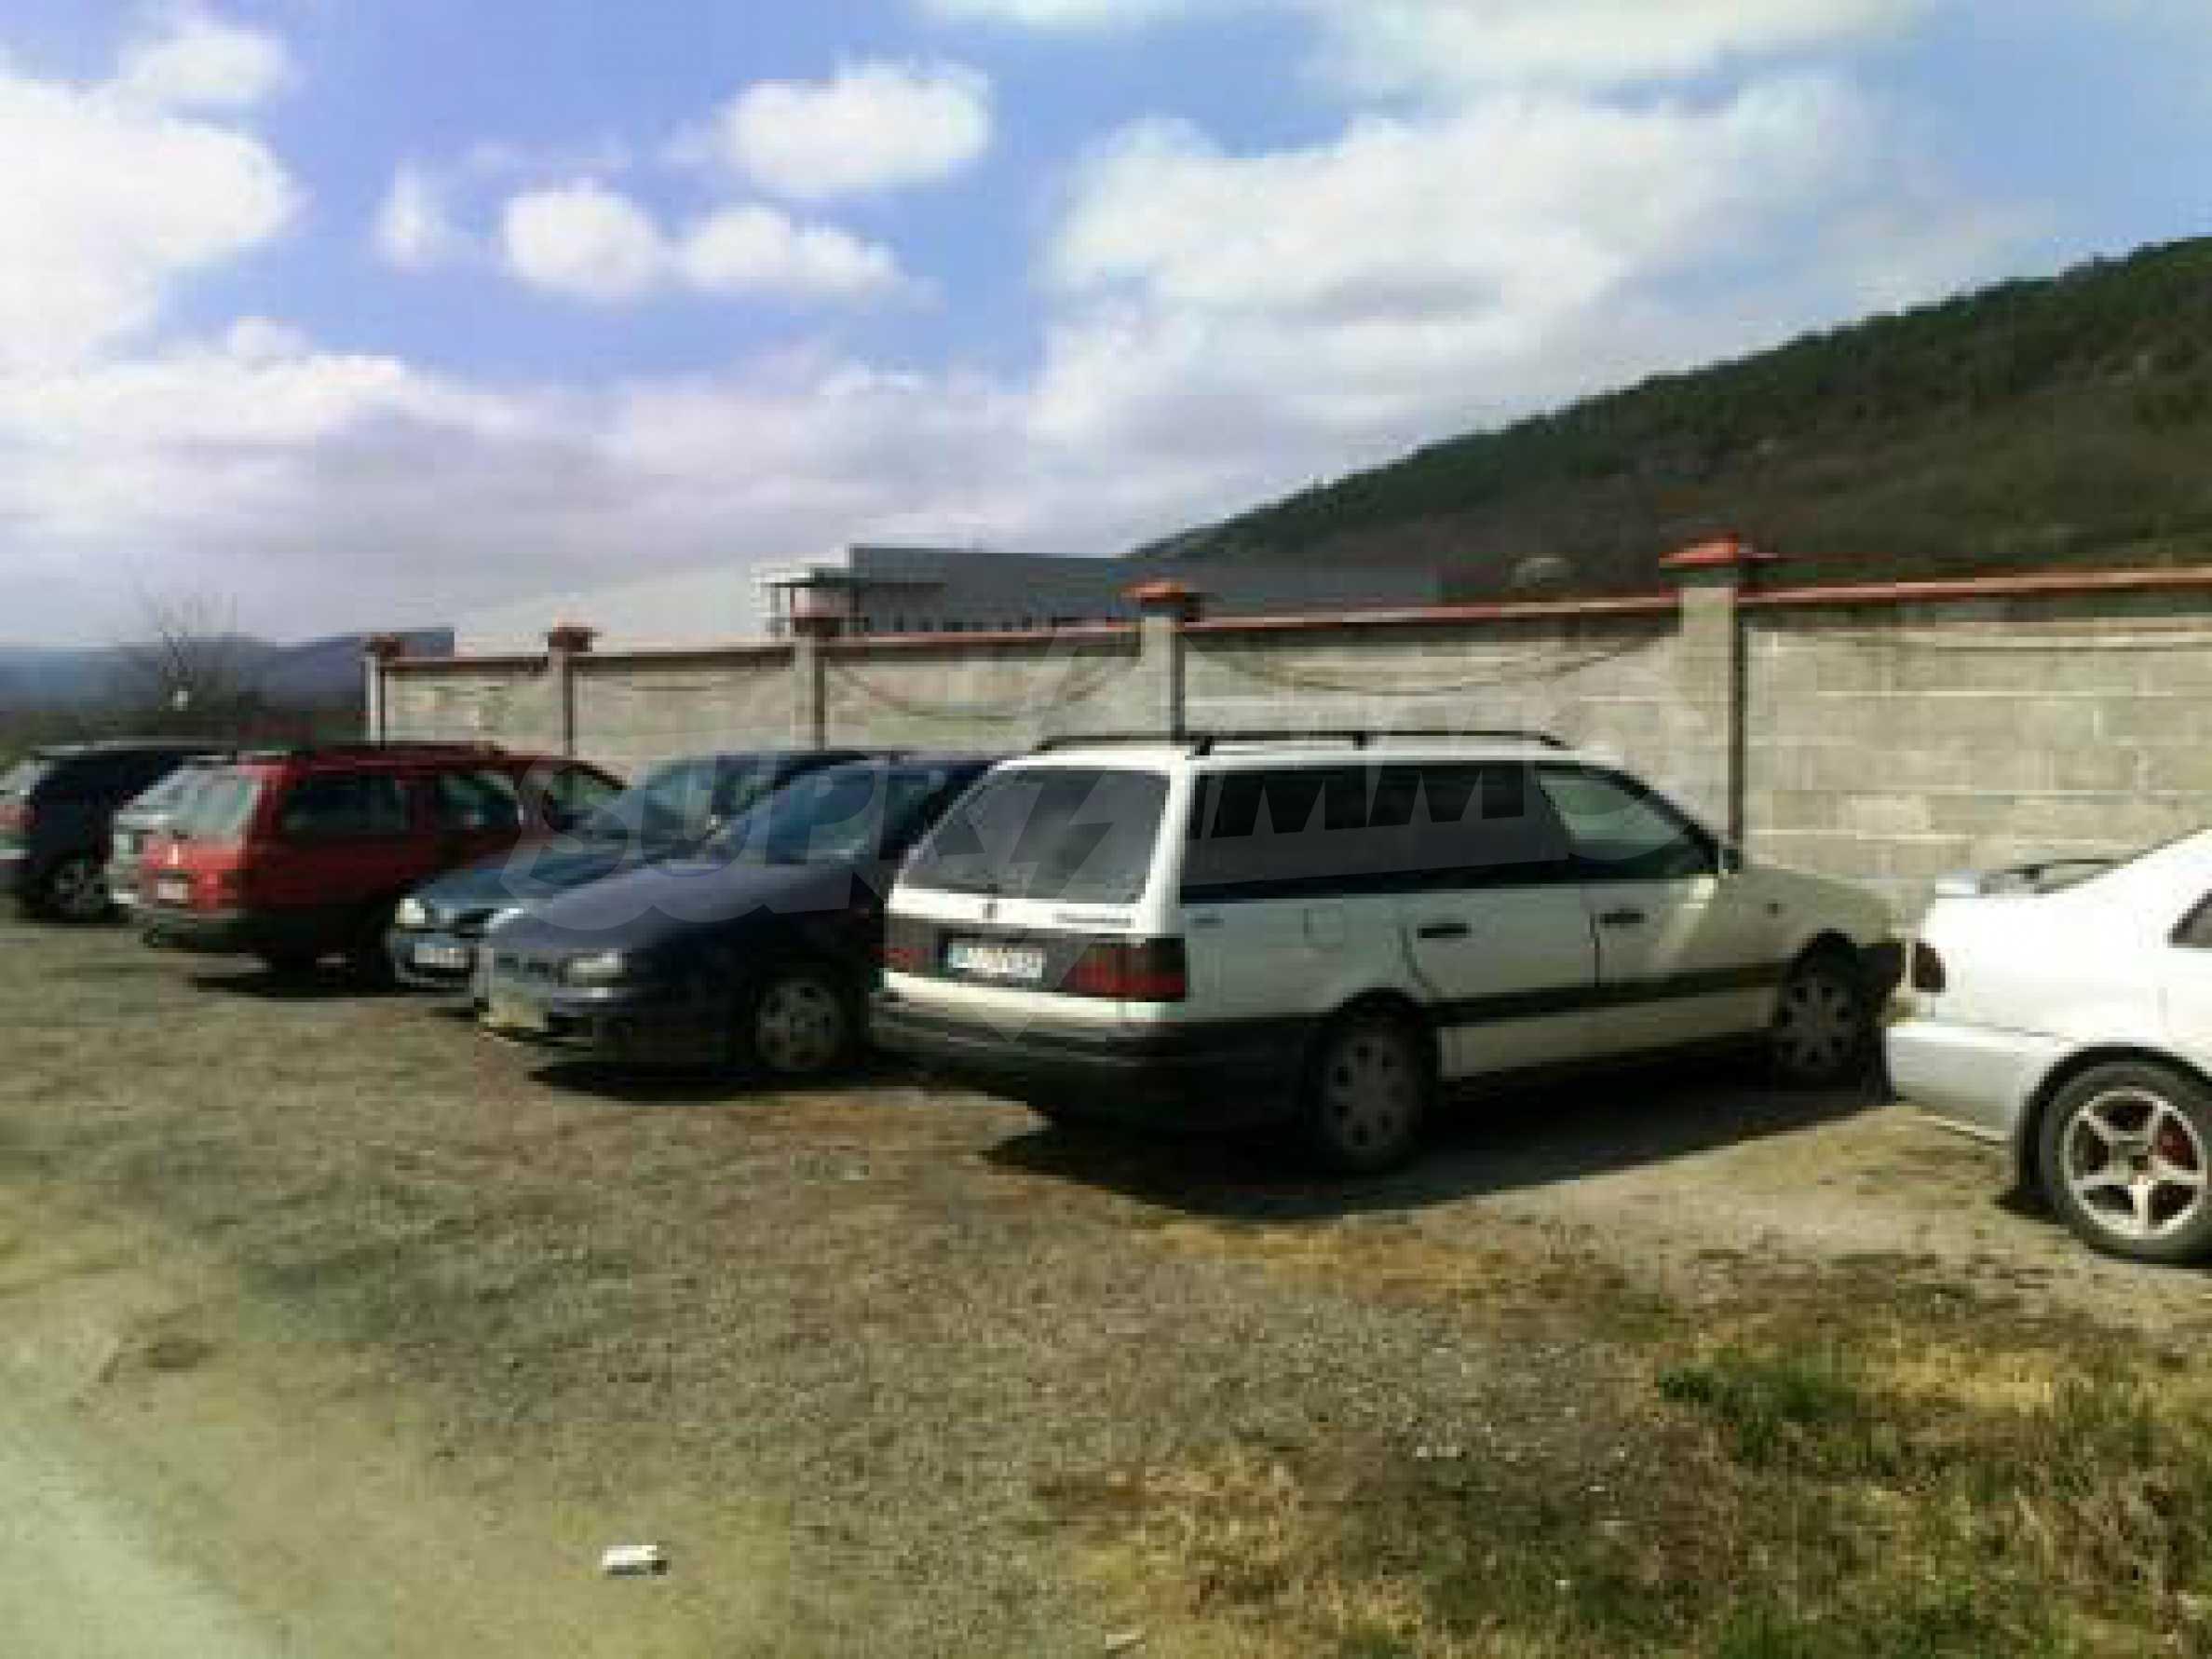 Warehouse on the main E85 road, Rousse-Svilengrad  15